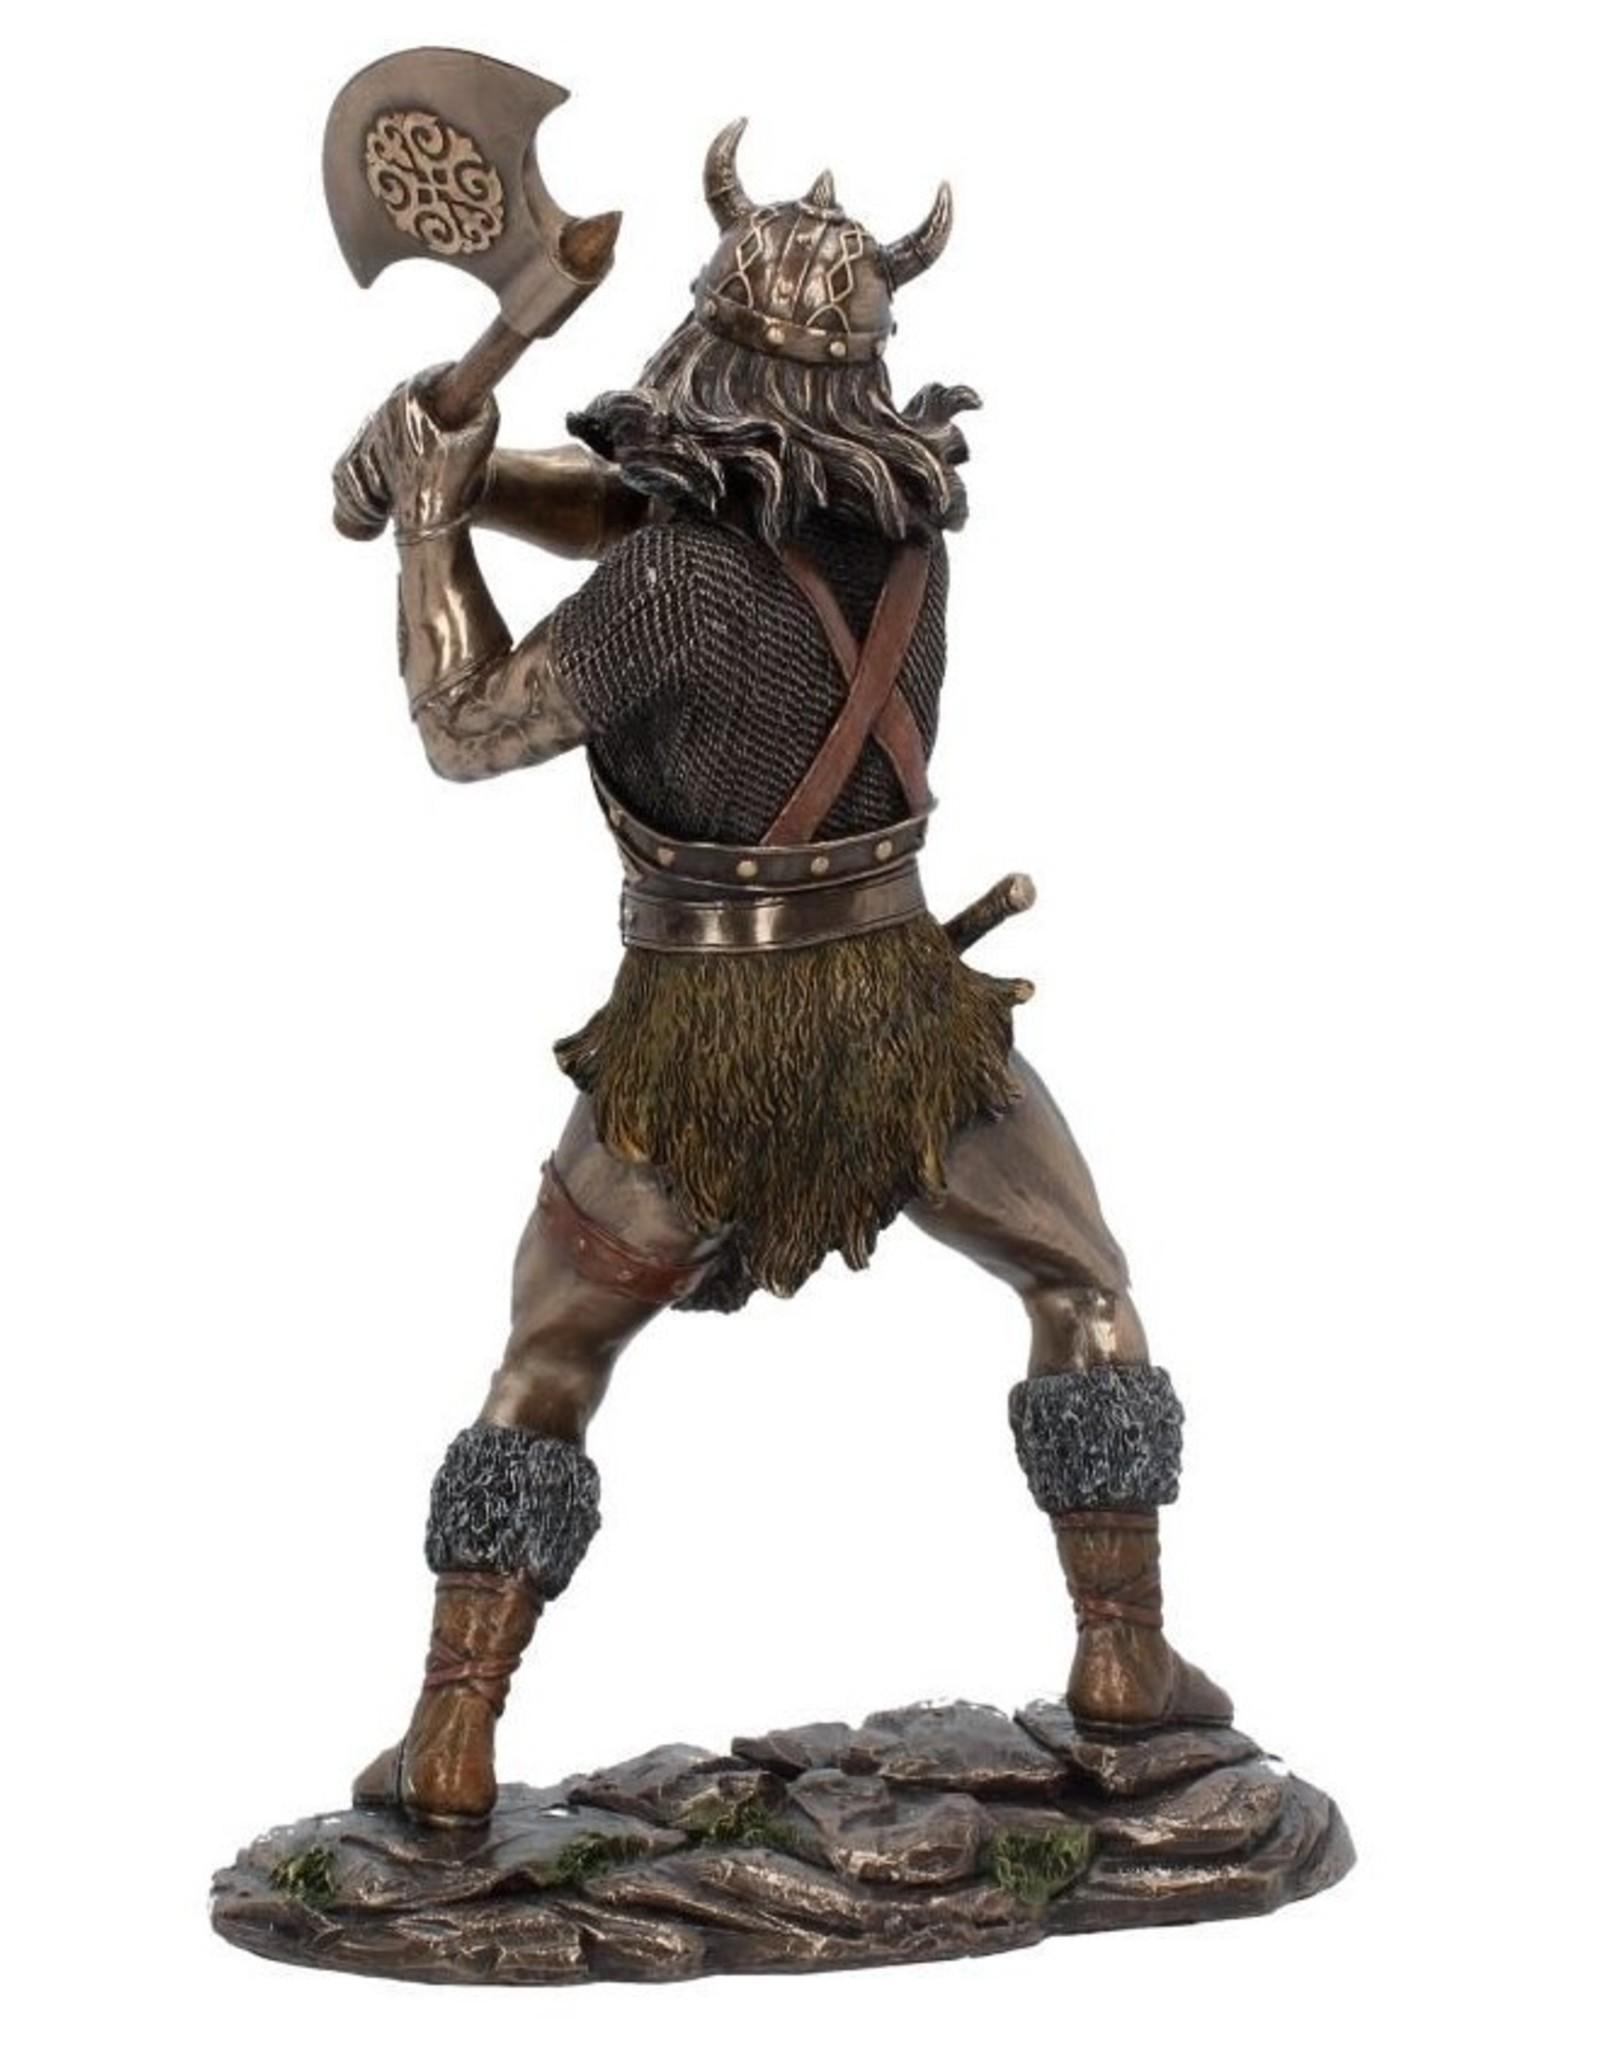 NemesisNow Giftware Figurines Collectables - Berseker Bronzed figurine 28,5cm